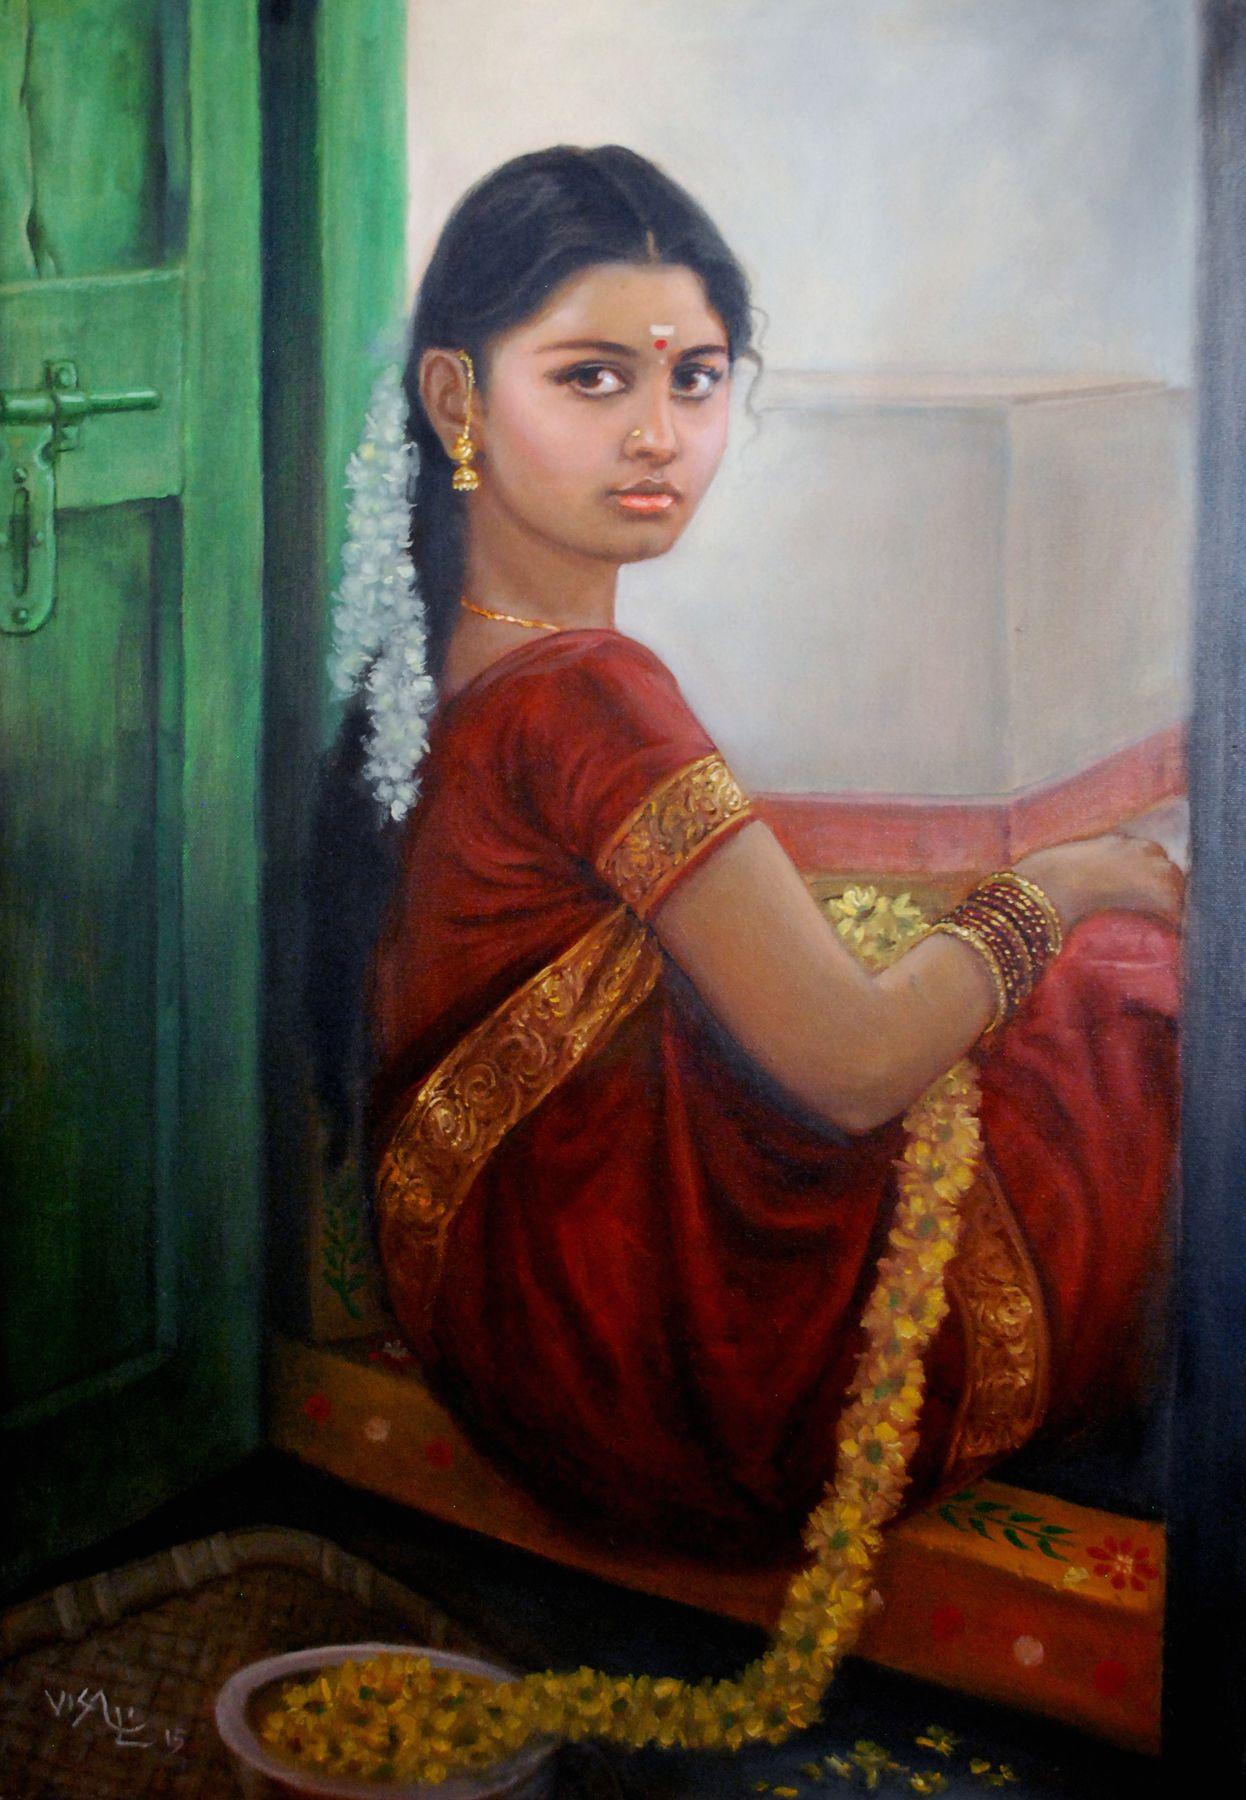 Tamil Girl Sitting By The Door Dravidian Tamil Girls